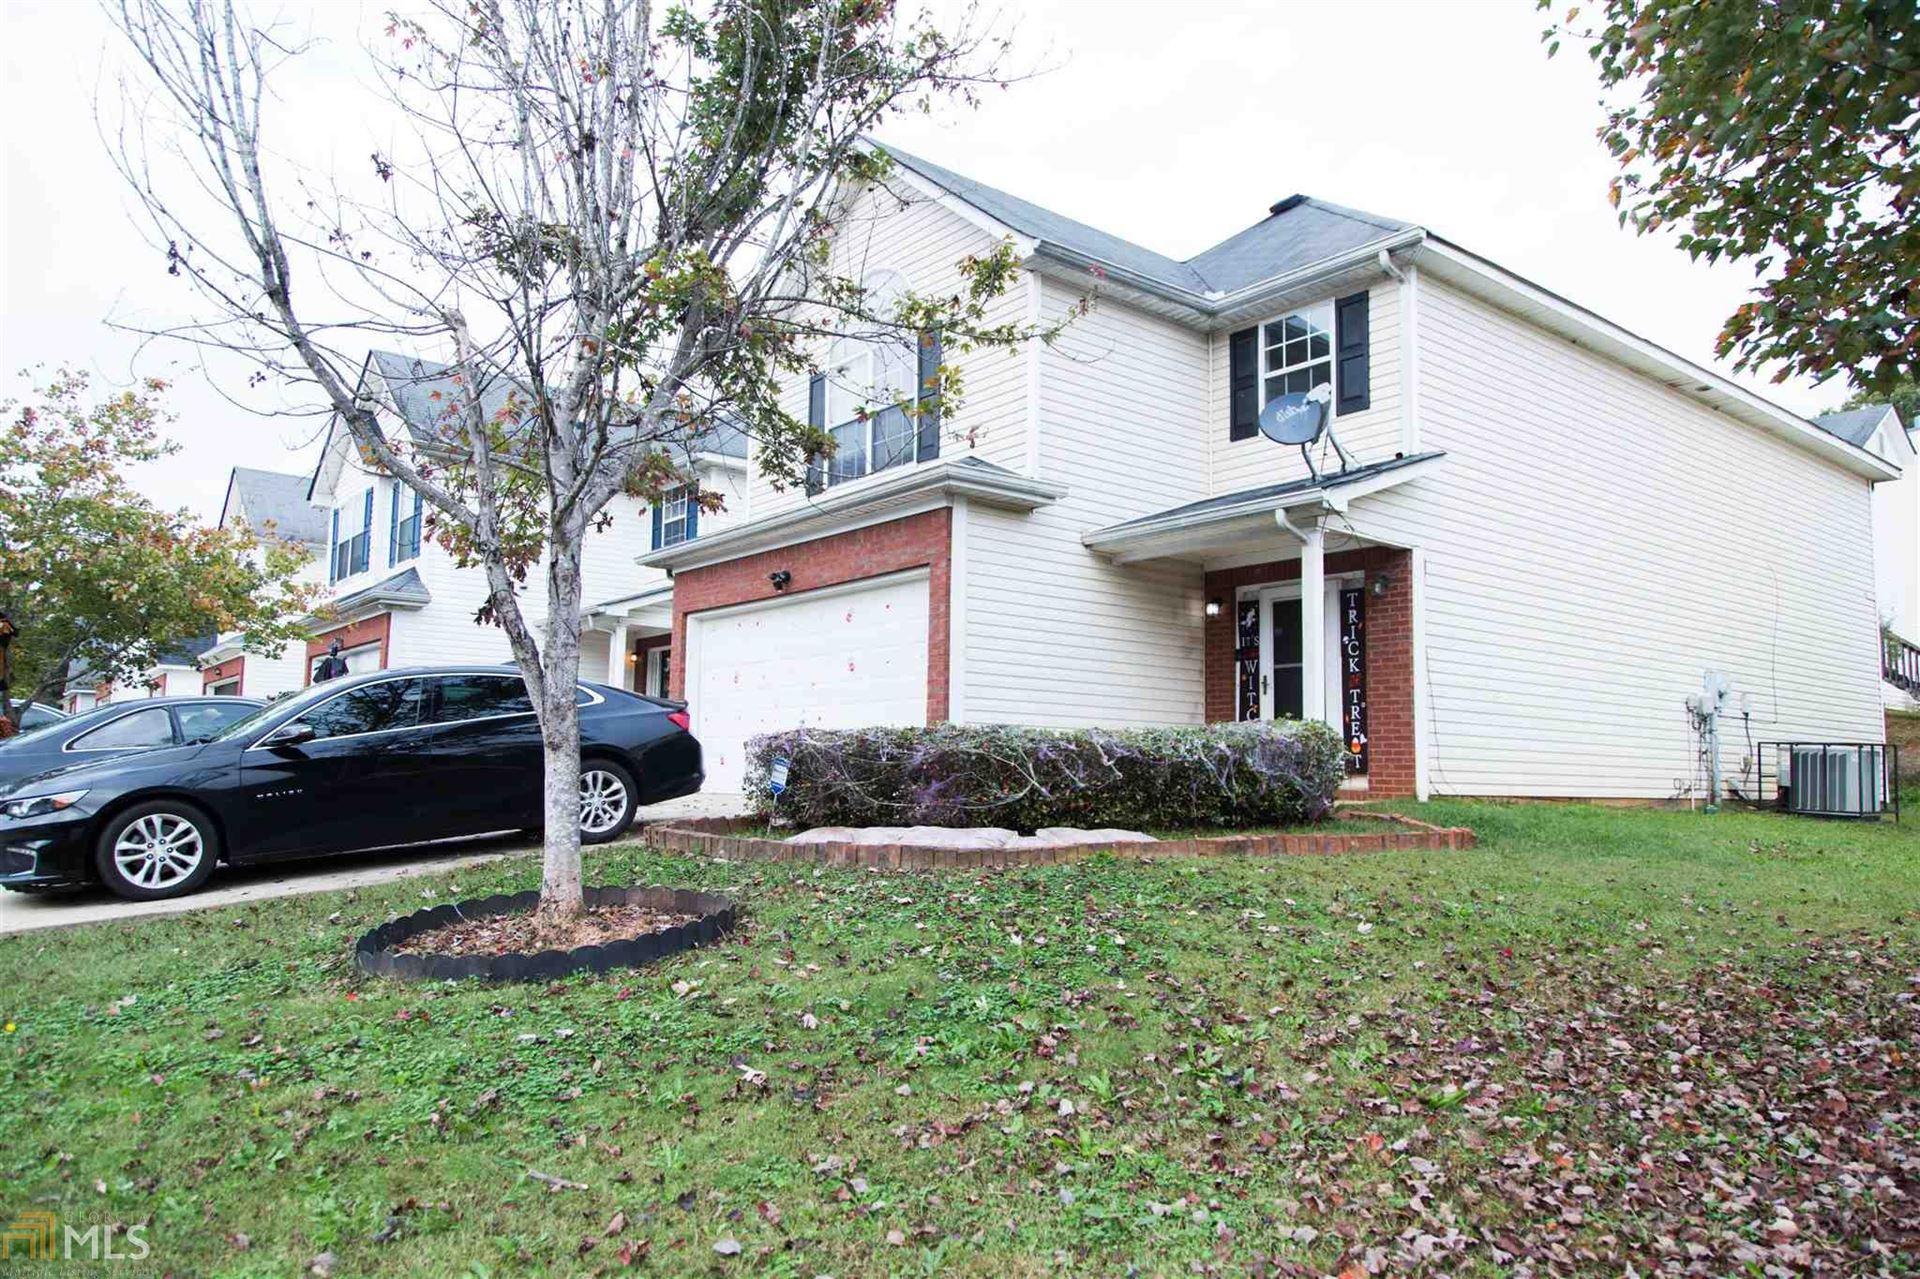 740 Wood Bend Ct, Riverdale, GA 30296 - #: 8880995